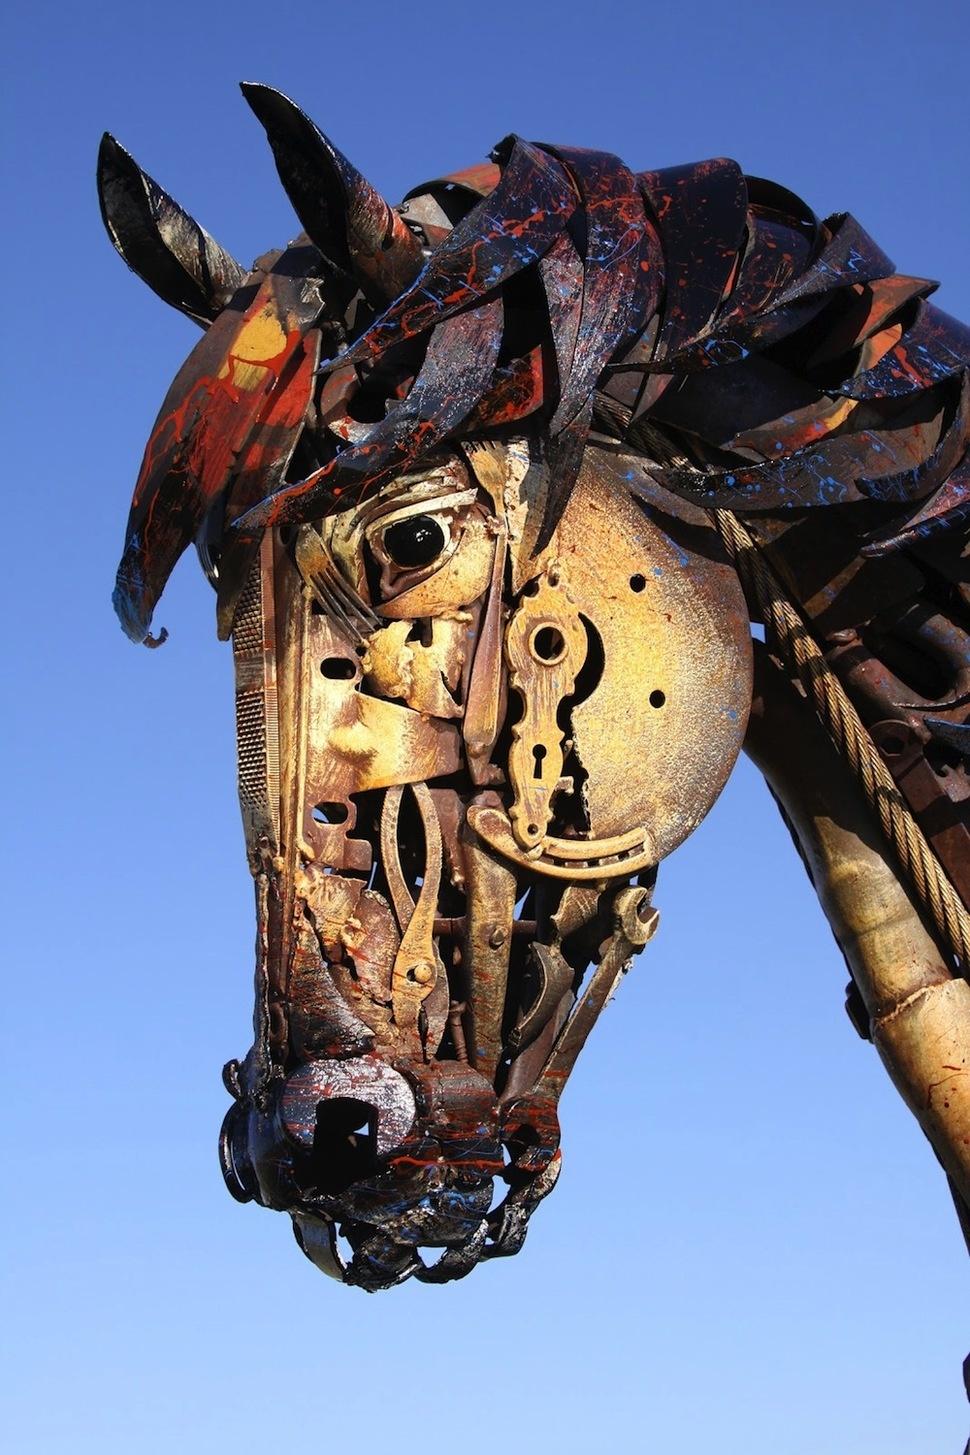 Obaldennye-skulptury-izmetalloloma-16-foto